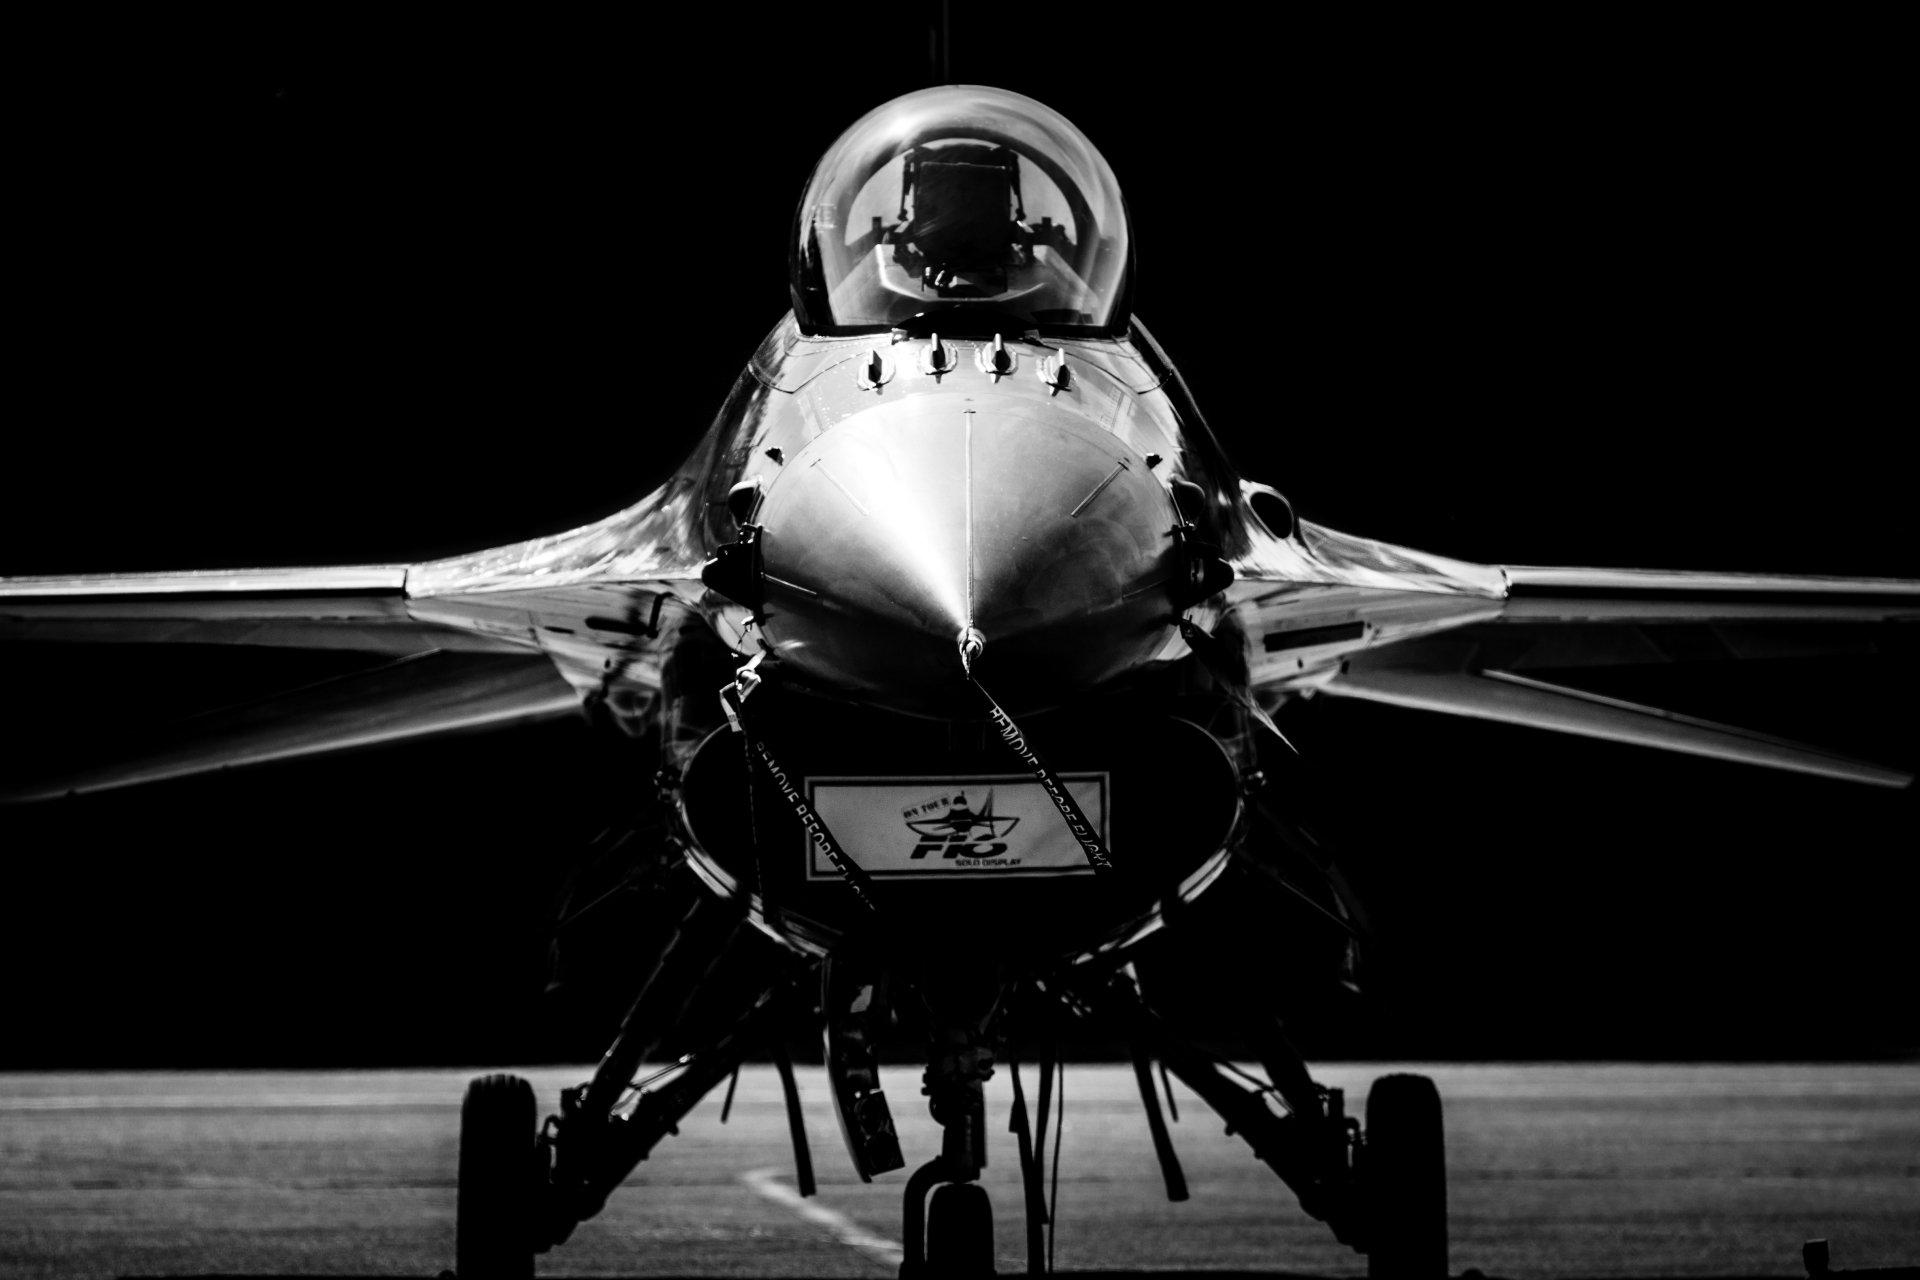 Iphone X Off White Wallpaper General Dynamics F 16 Fighting Falcon 4k Ultra Hd